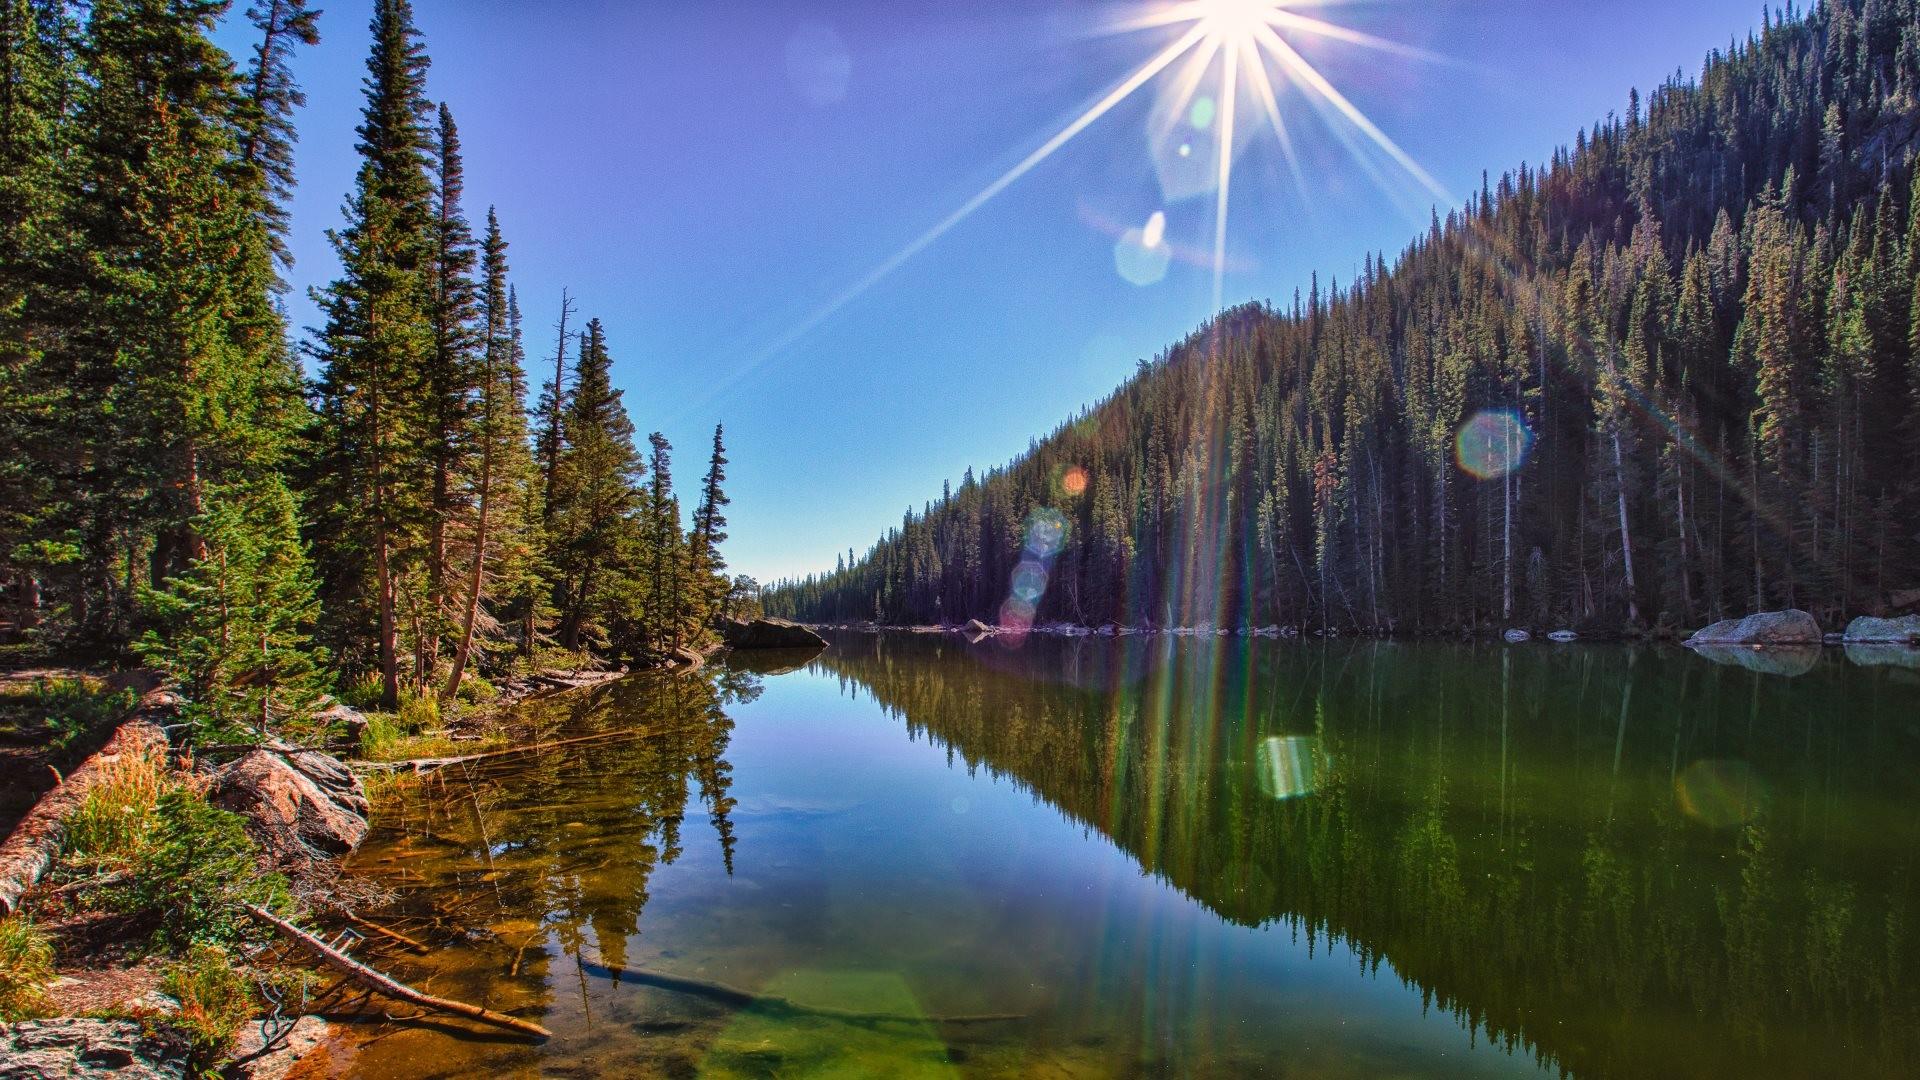 4K HD Wallpaper: Landscape – The Sun, reflected in Dream Lake in Rocky  Mountain National Park